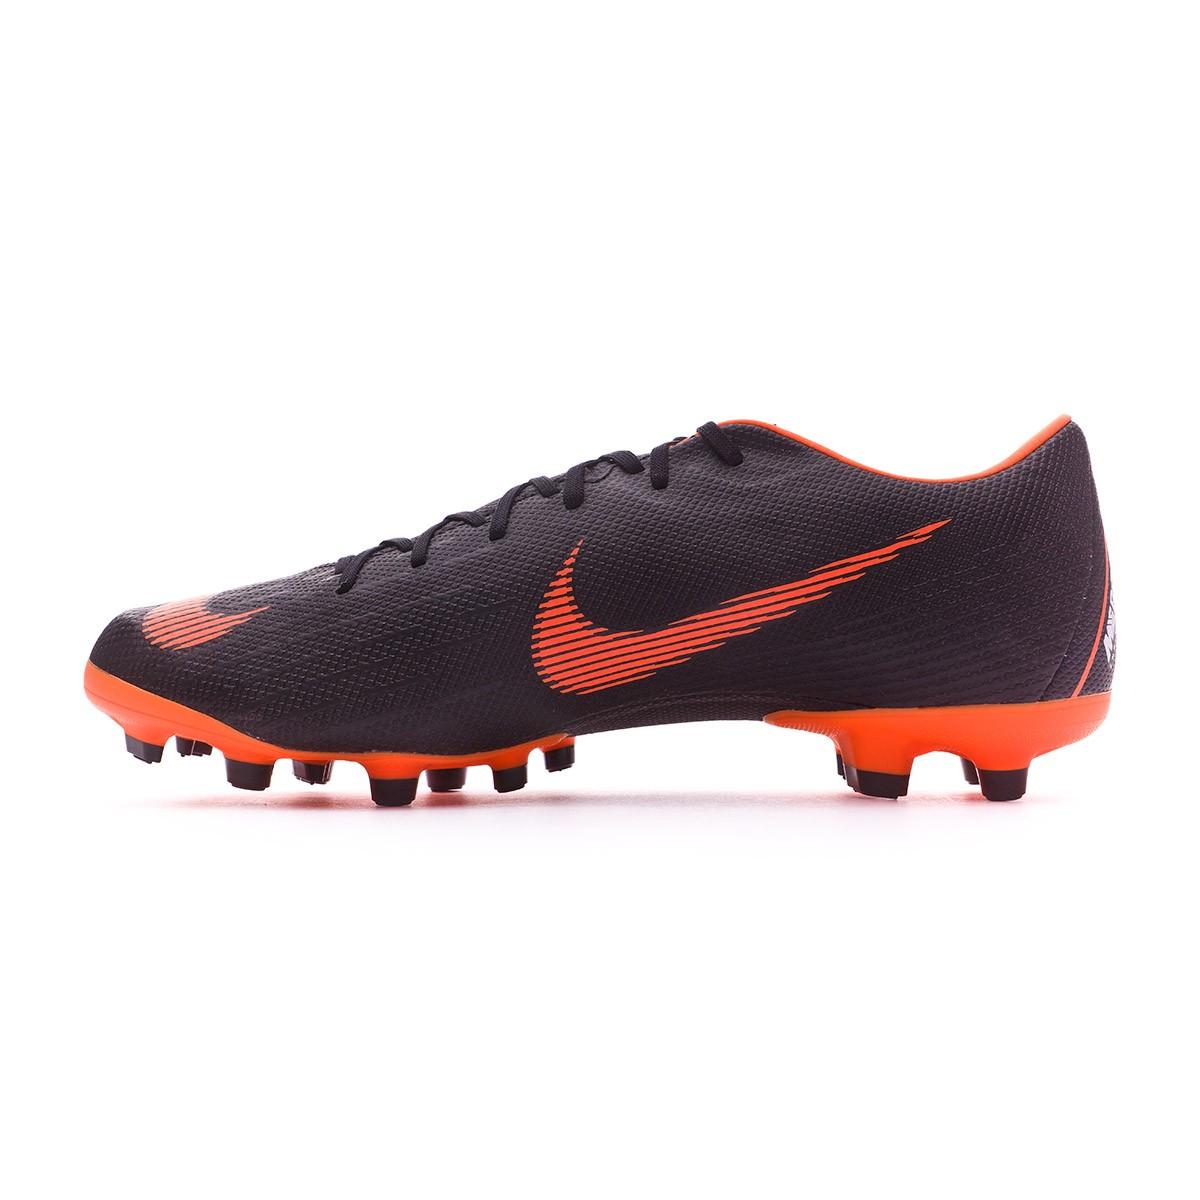 official photos 0da45 ba64f Bota de fútbol Nike Mercurial Vapor XII Academy MG Black-Total orange-White  - Tienda de fútbol Fútbol Emotion